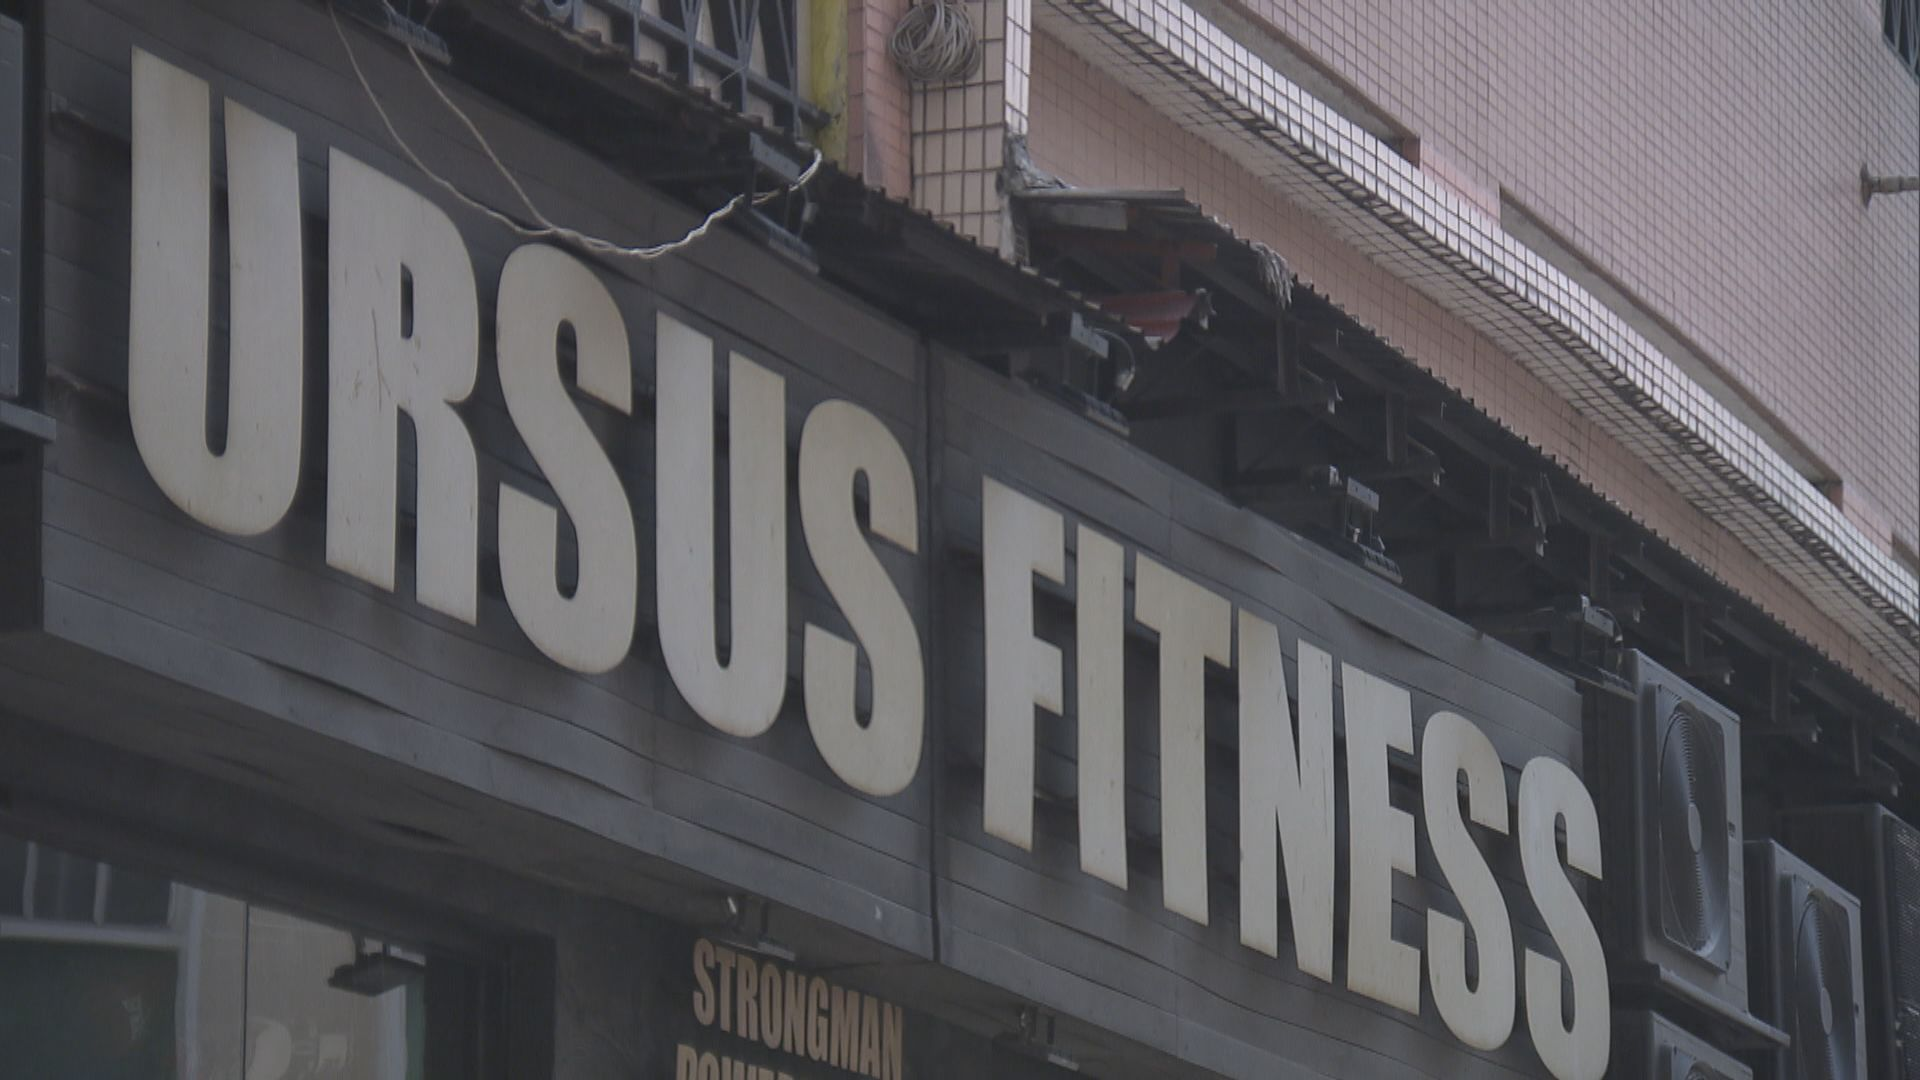 袁國勇:Ursus Fitness無鮮風供應導致爆發